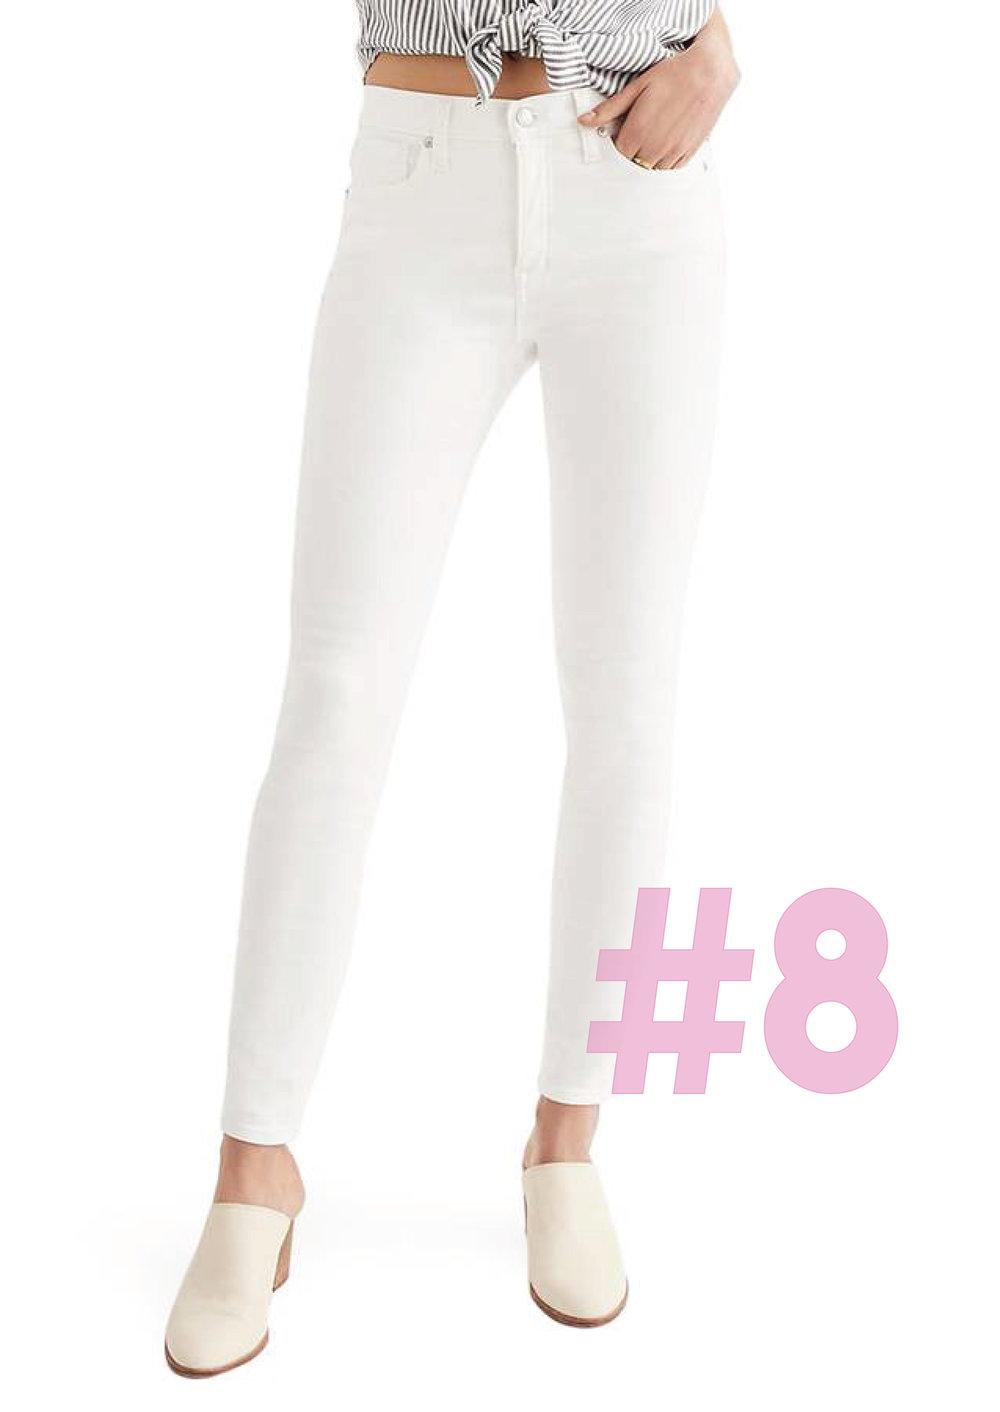 Jeans-8.jpg